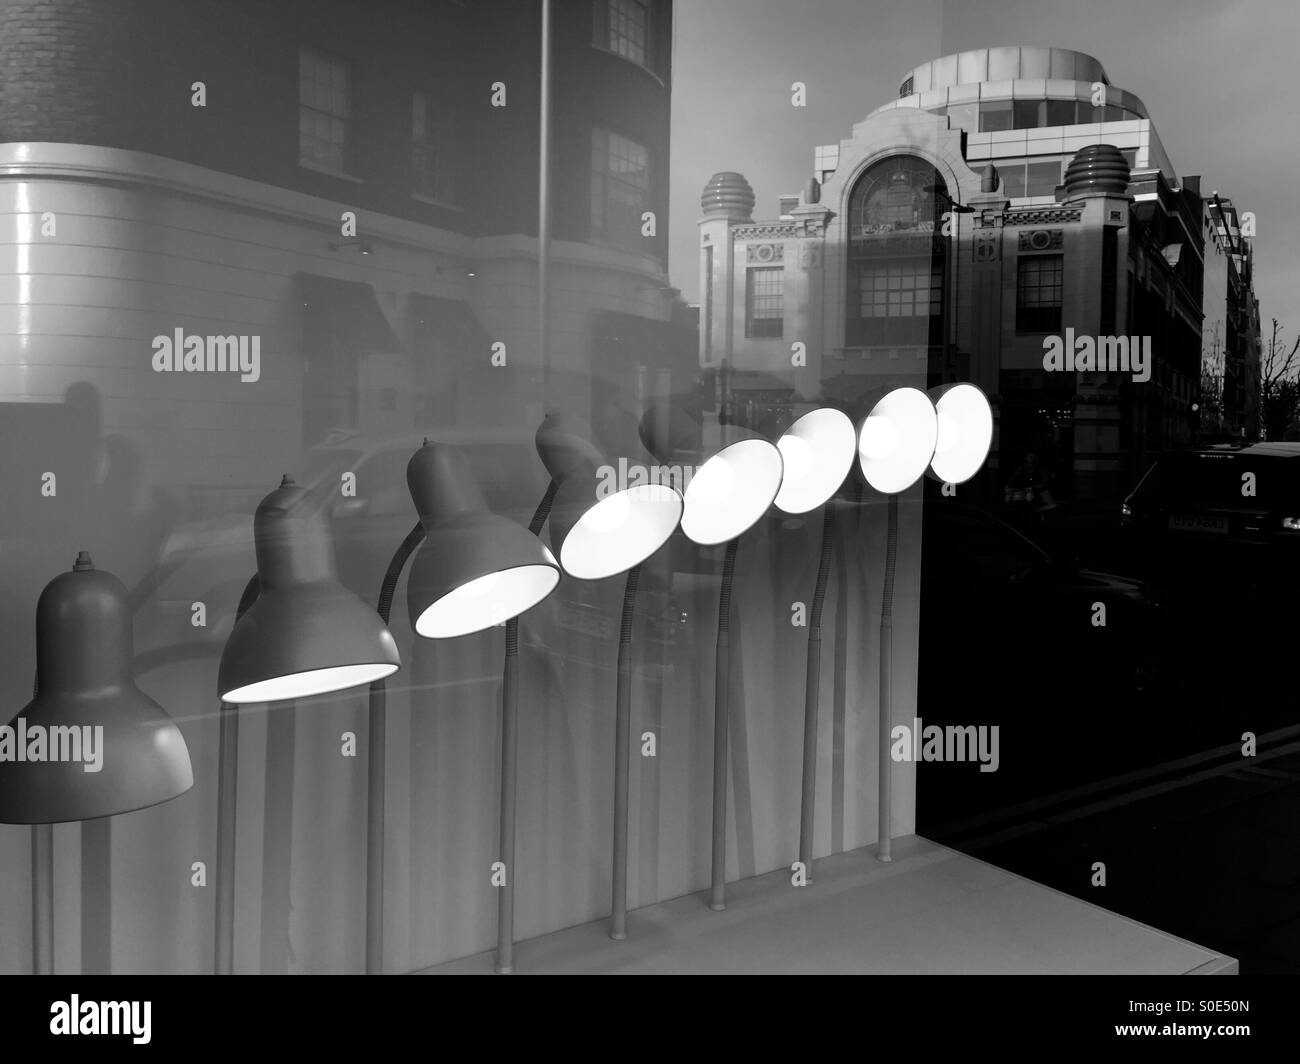 Vibe dun, Fulham road,London - Stock Image